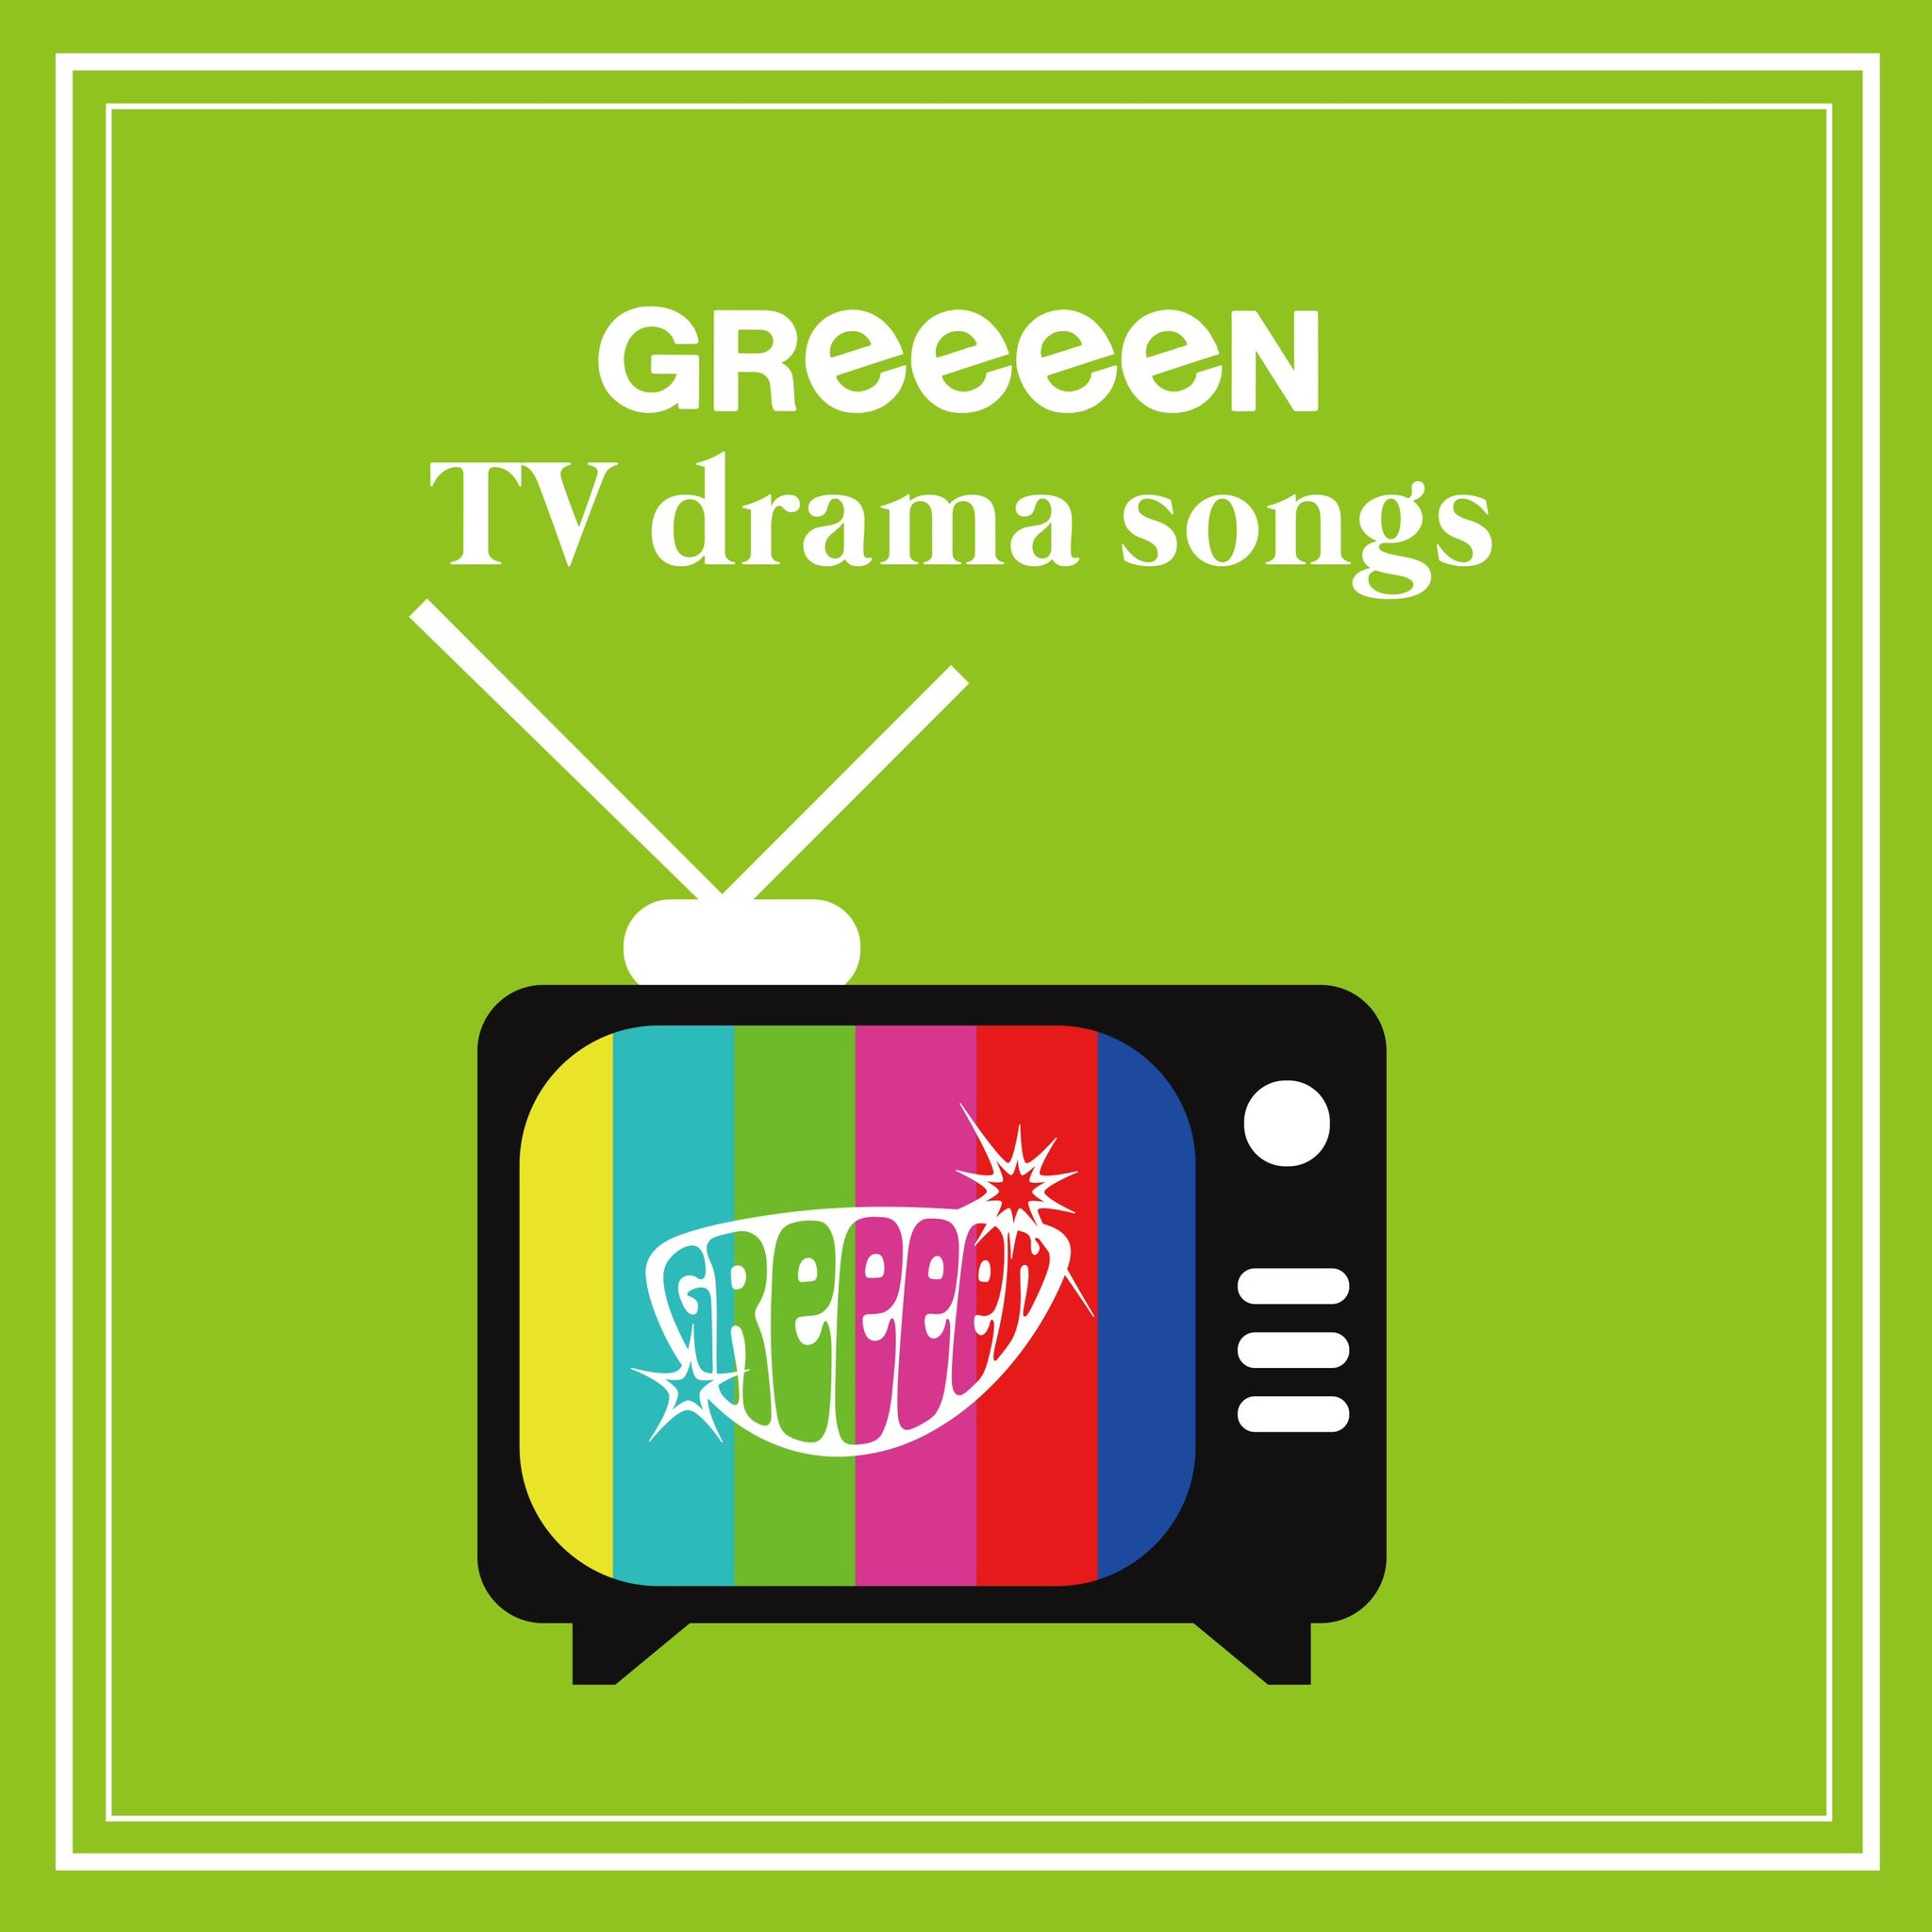 GReeeeN TV drama songs